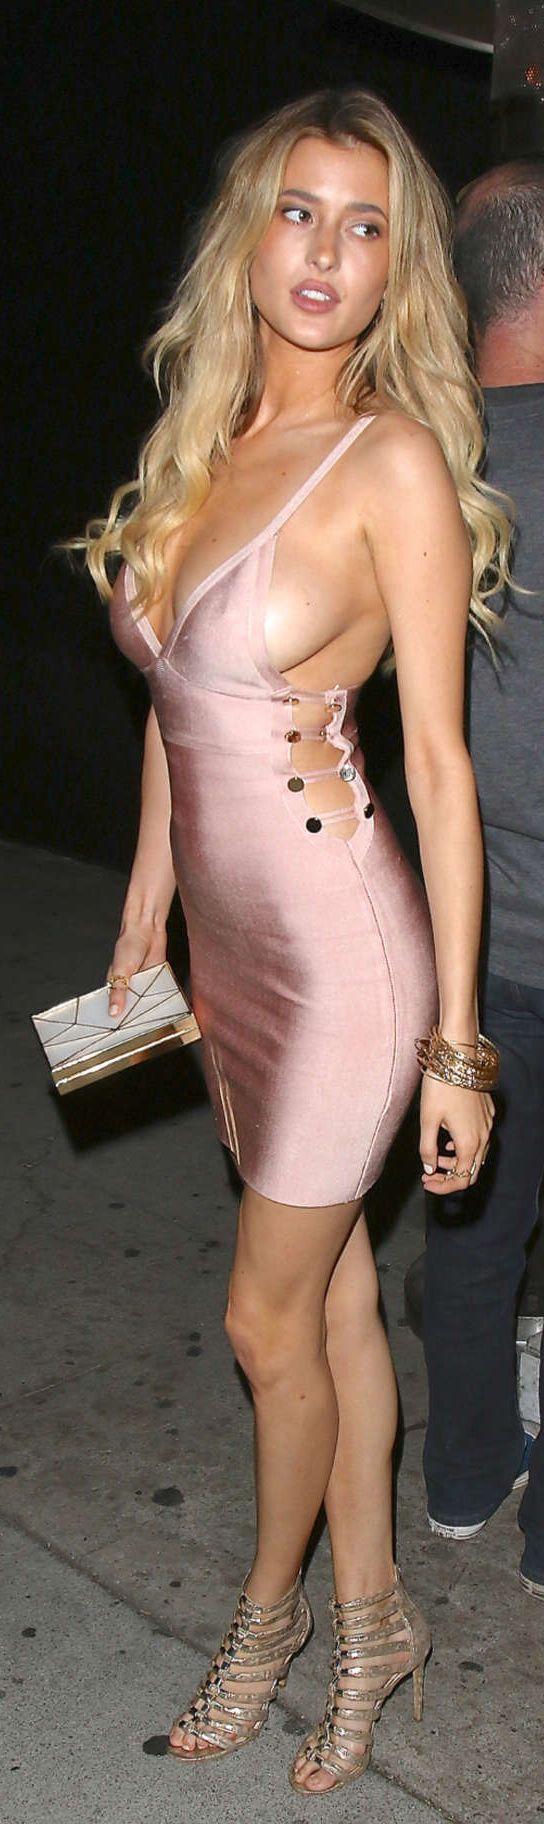 Ivy Levan Nude Beautiful gemma vence   gemma vence   pinterest   nice curves, longest legs